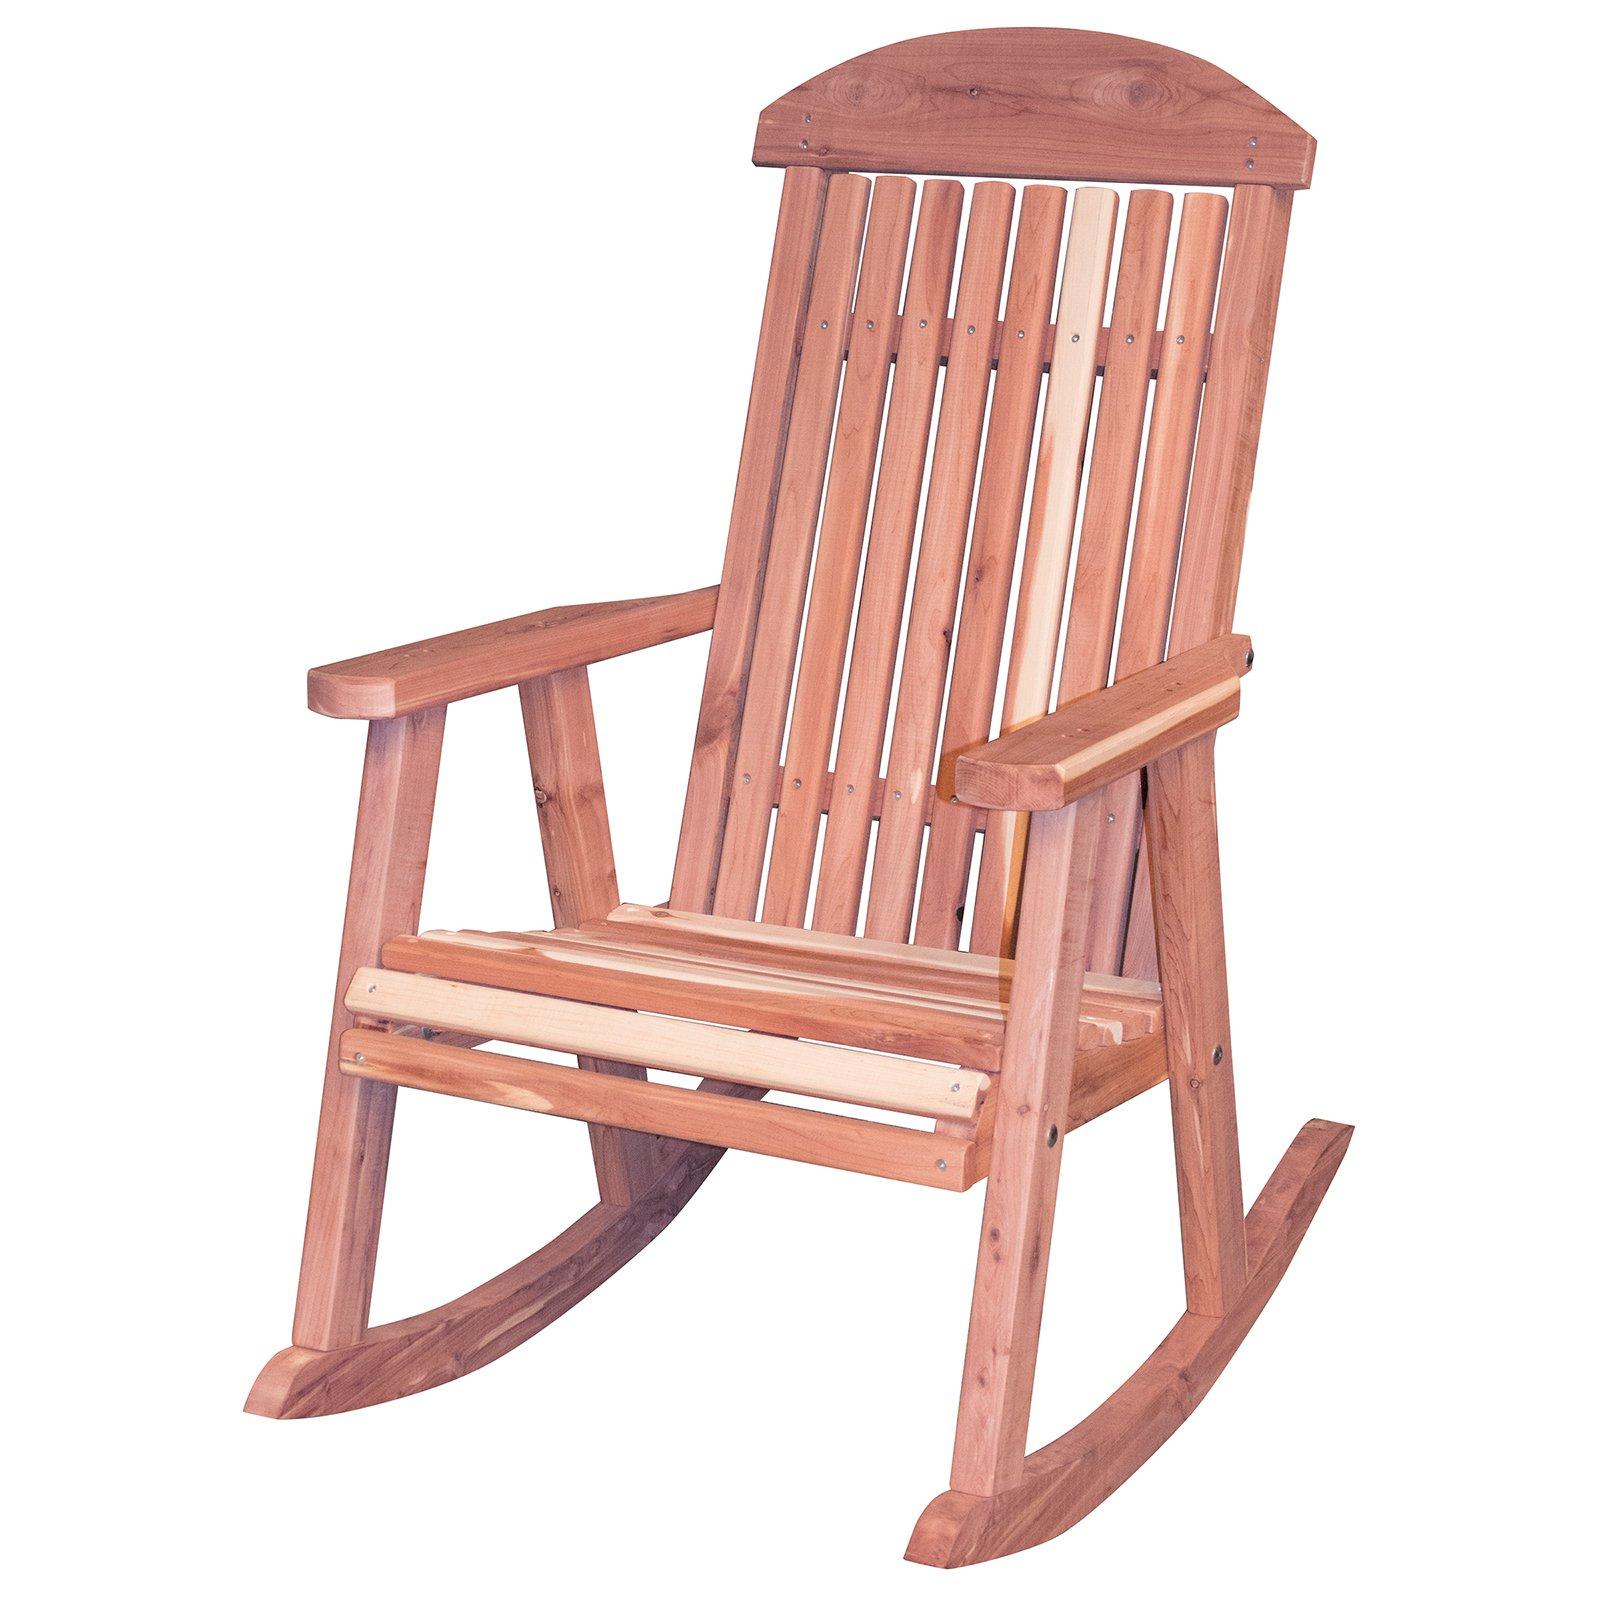 cedar rocking chairs fixing wicker amerihome usa amish made chair walmart com